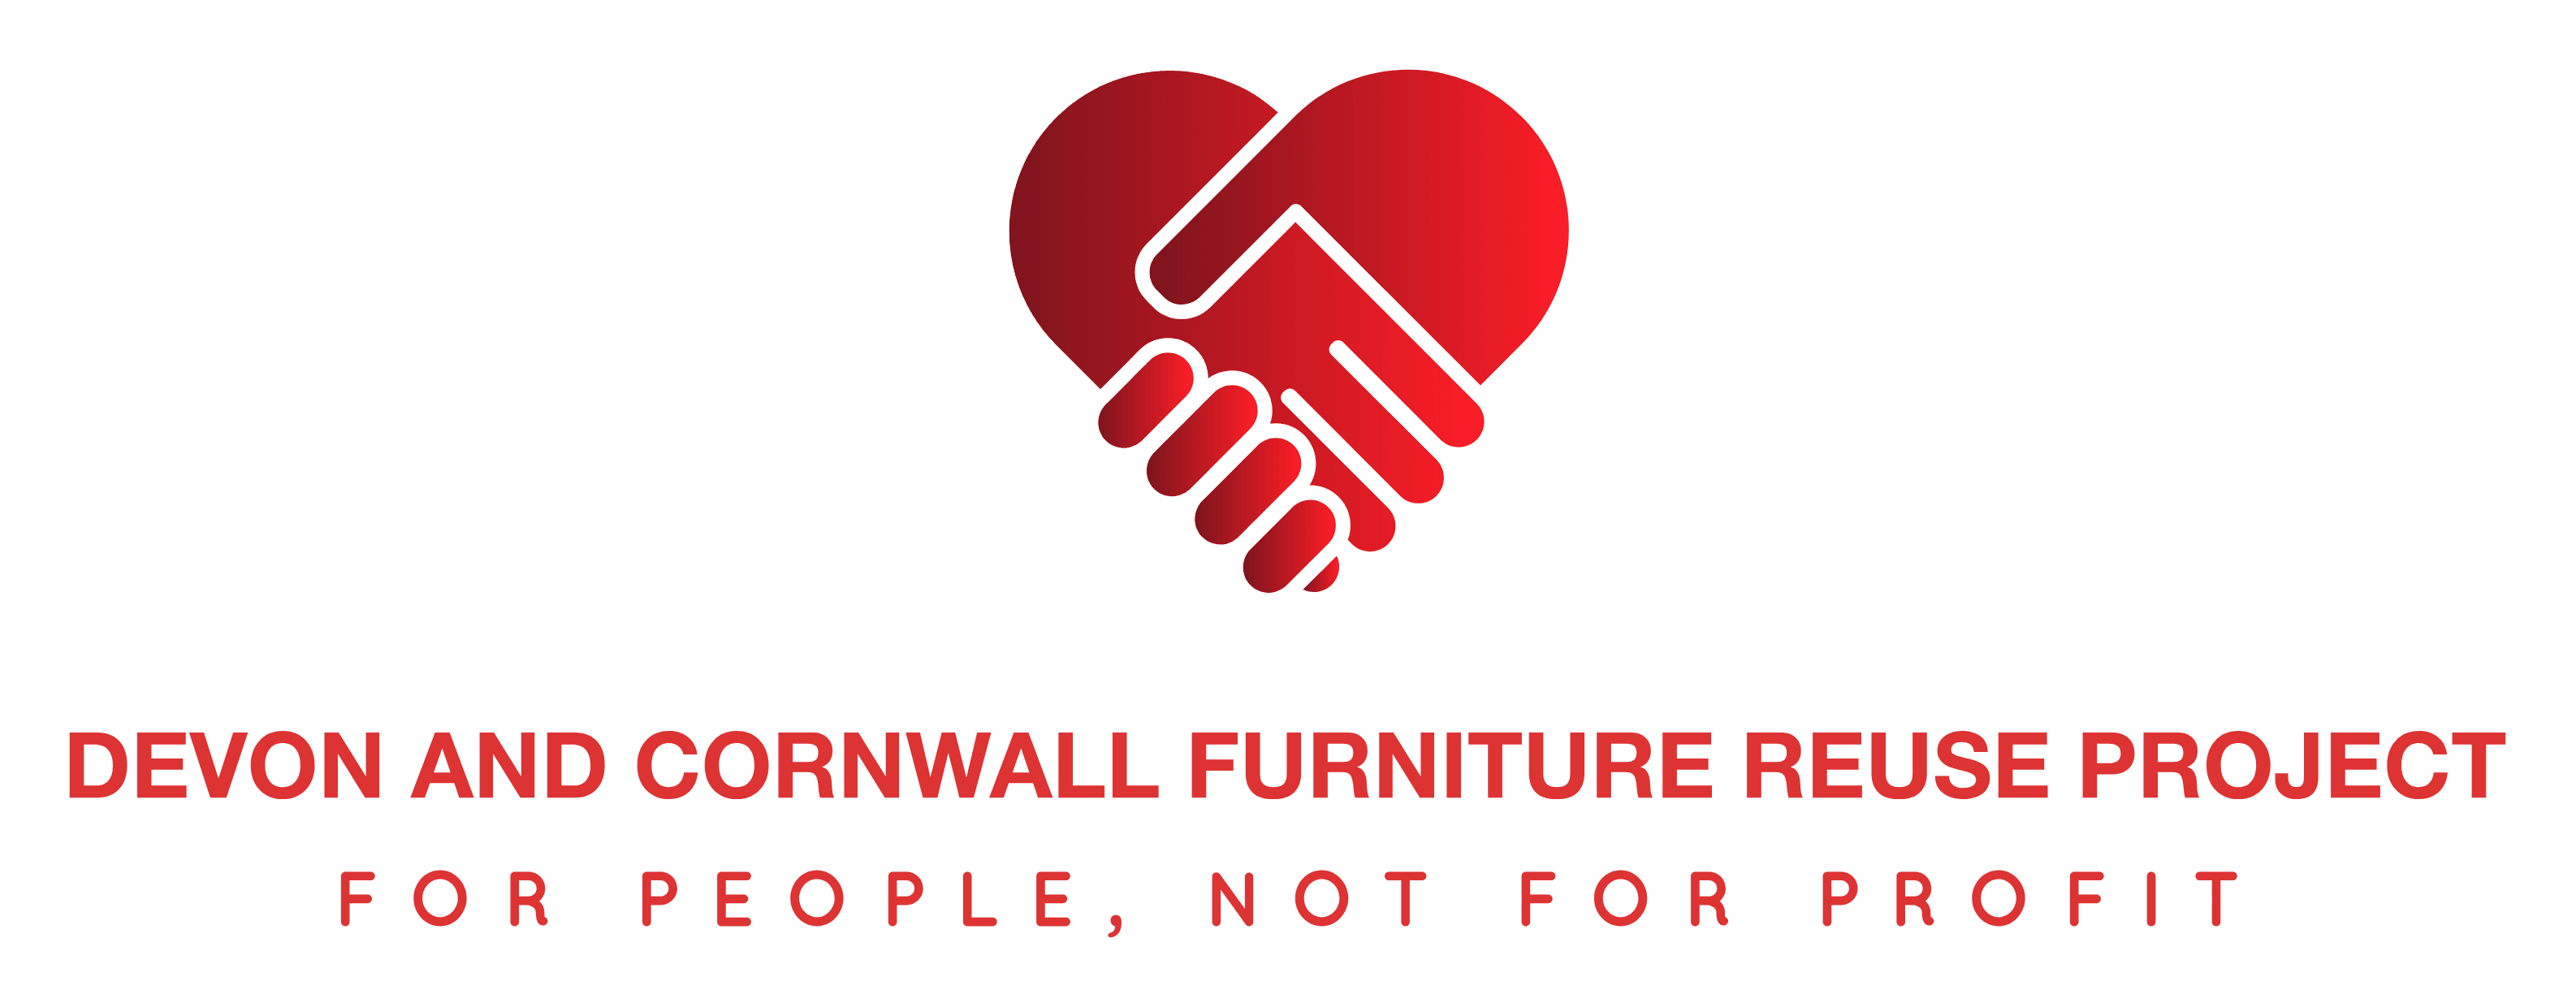 Devon and Cornwall Sofa donations